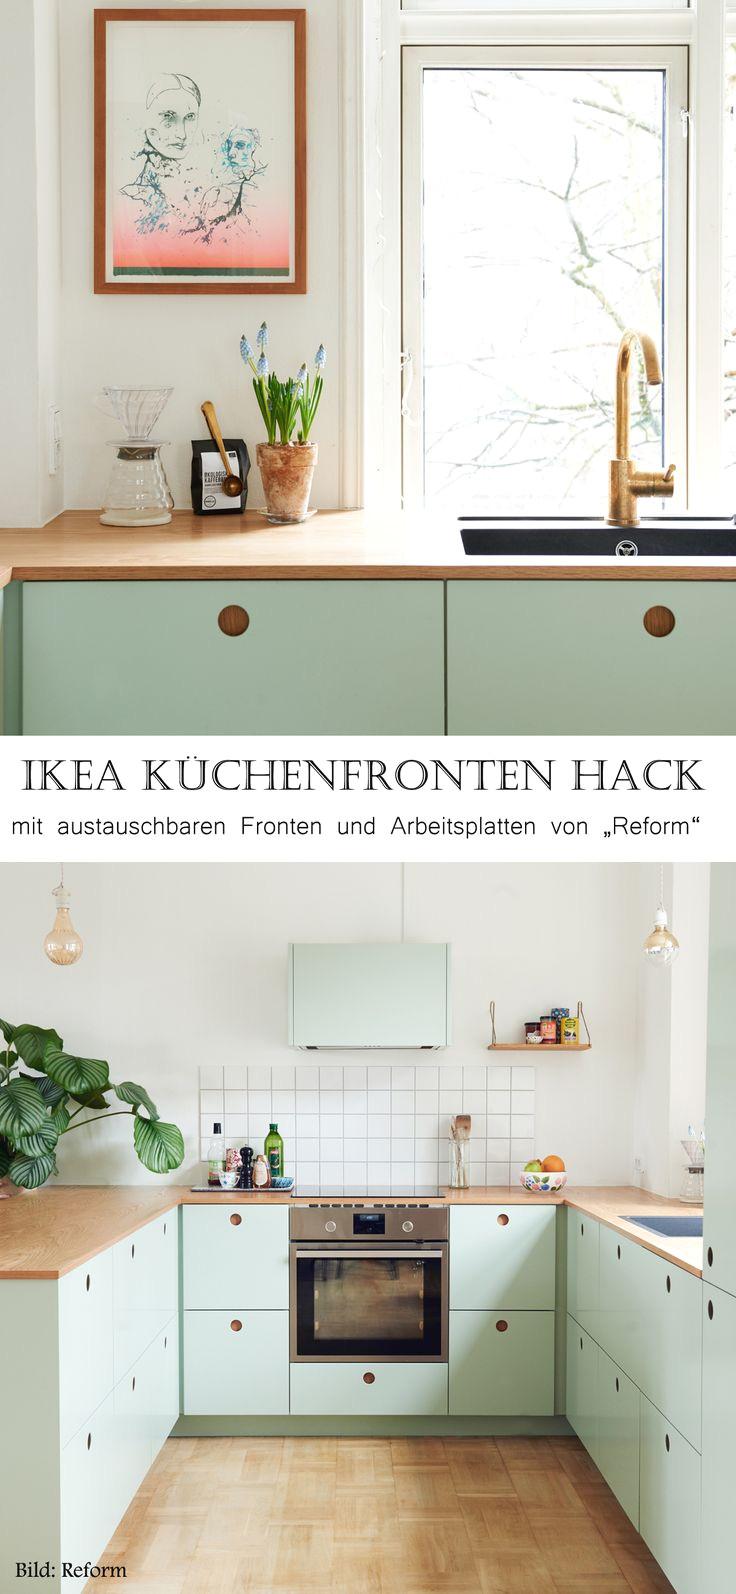 Full Size of Ikea Singleküche Värde Ideen Kche 99 Top Ebay Miniküche Betten 160x200 Küche Kosten Modulküche Mit E Geräten Kühlschrank Sofa Schlaffunktion Kaufen Bei Wohnzimmer Ikea Singleküche Värde